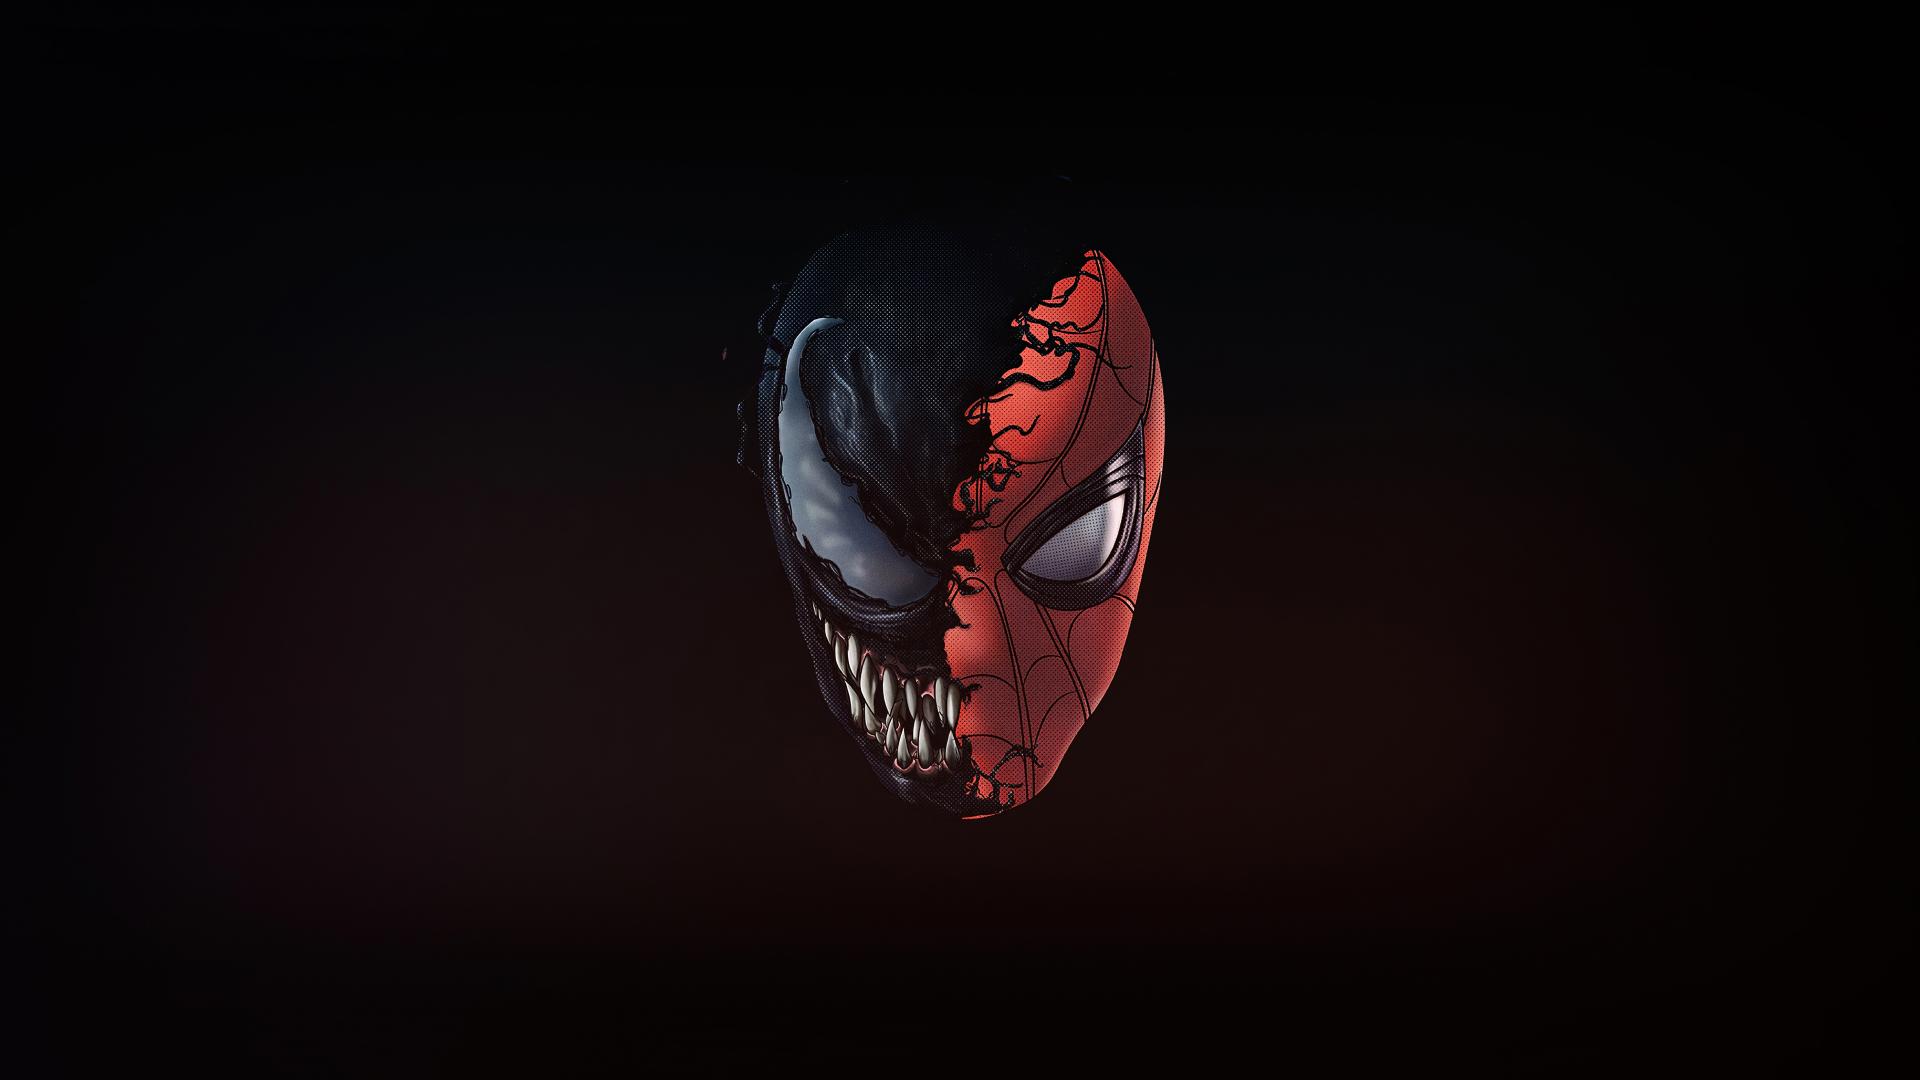 spider man and venom a21tZWmUmZqaraWkpJRmbmdlrWZlbWU